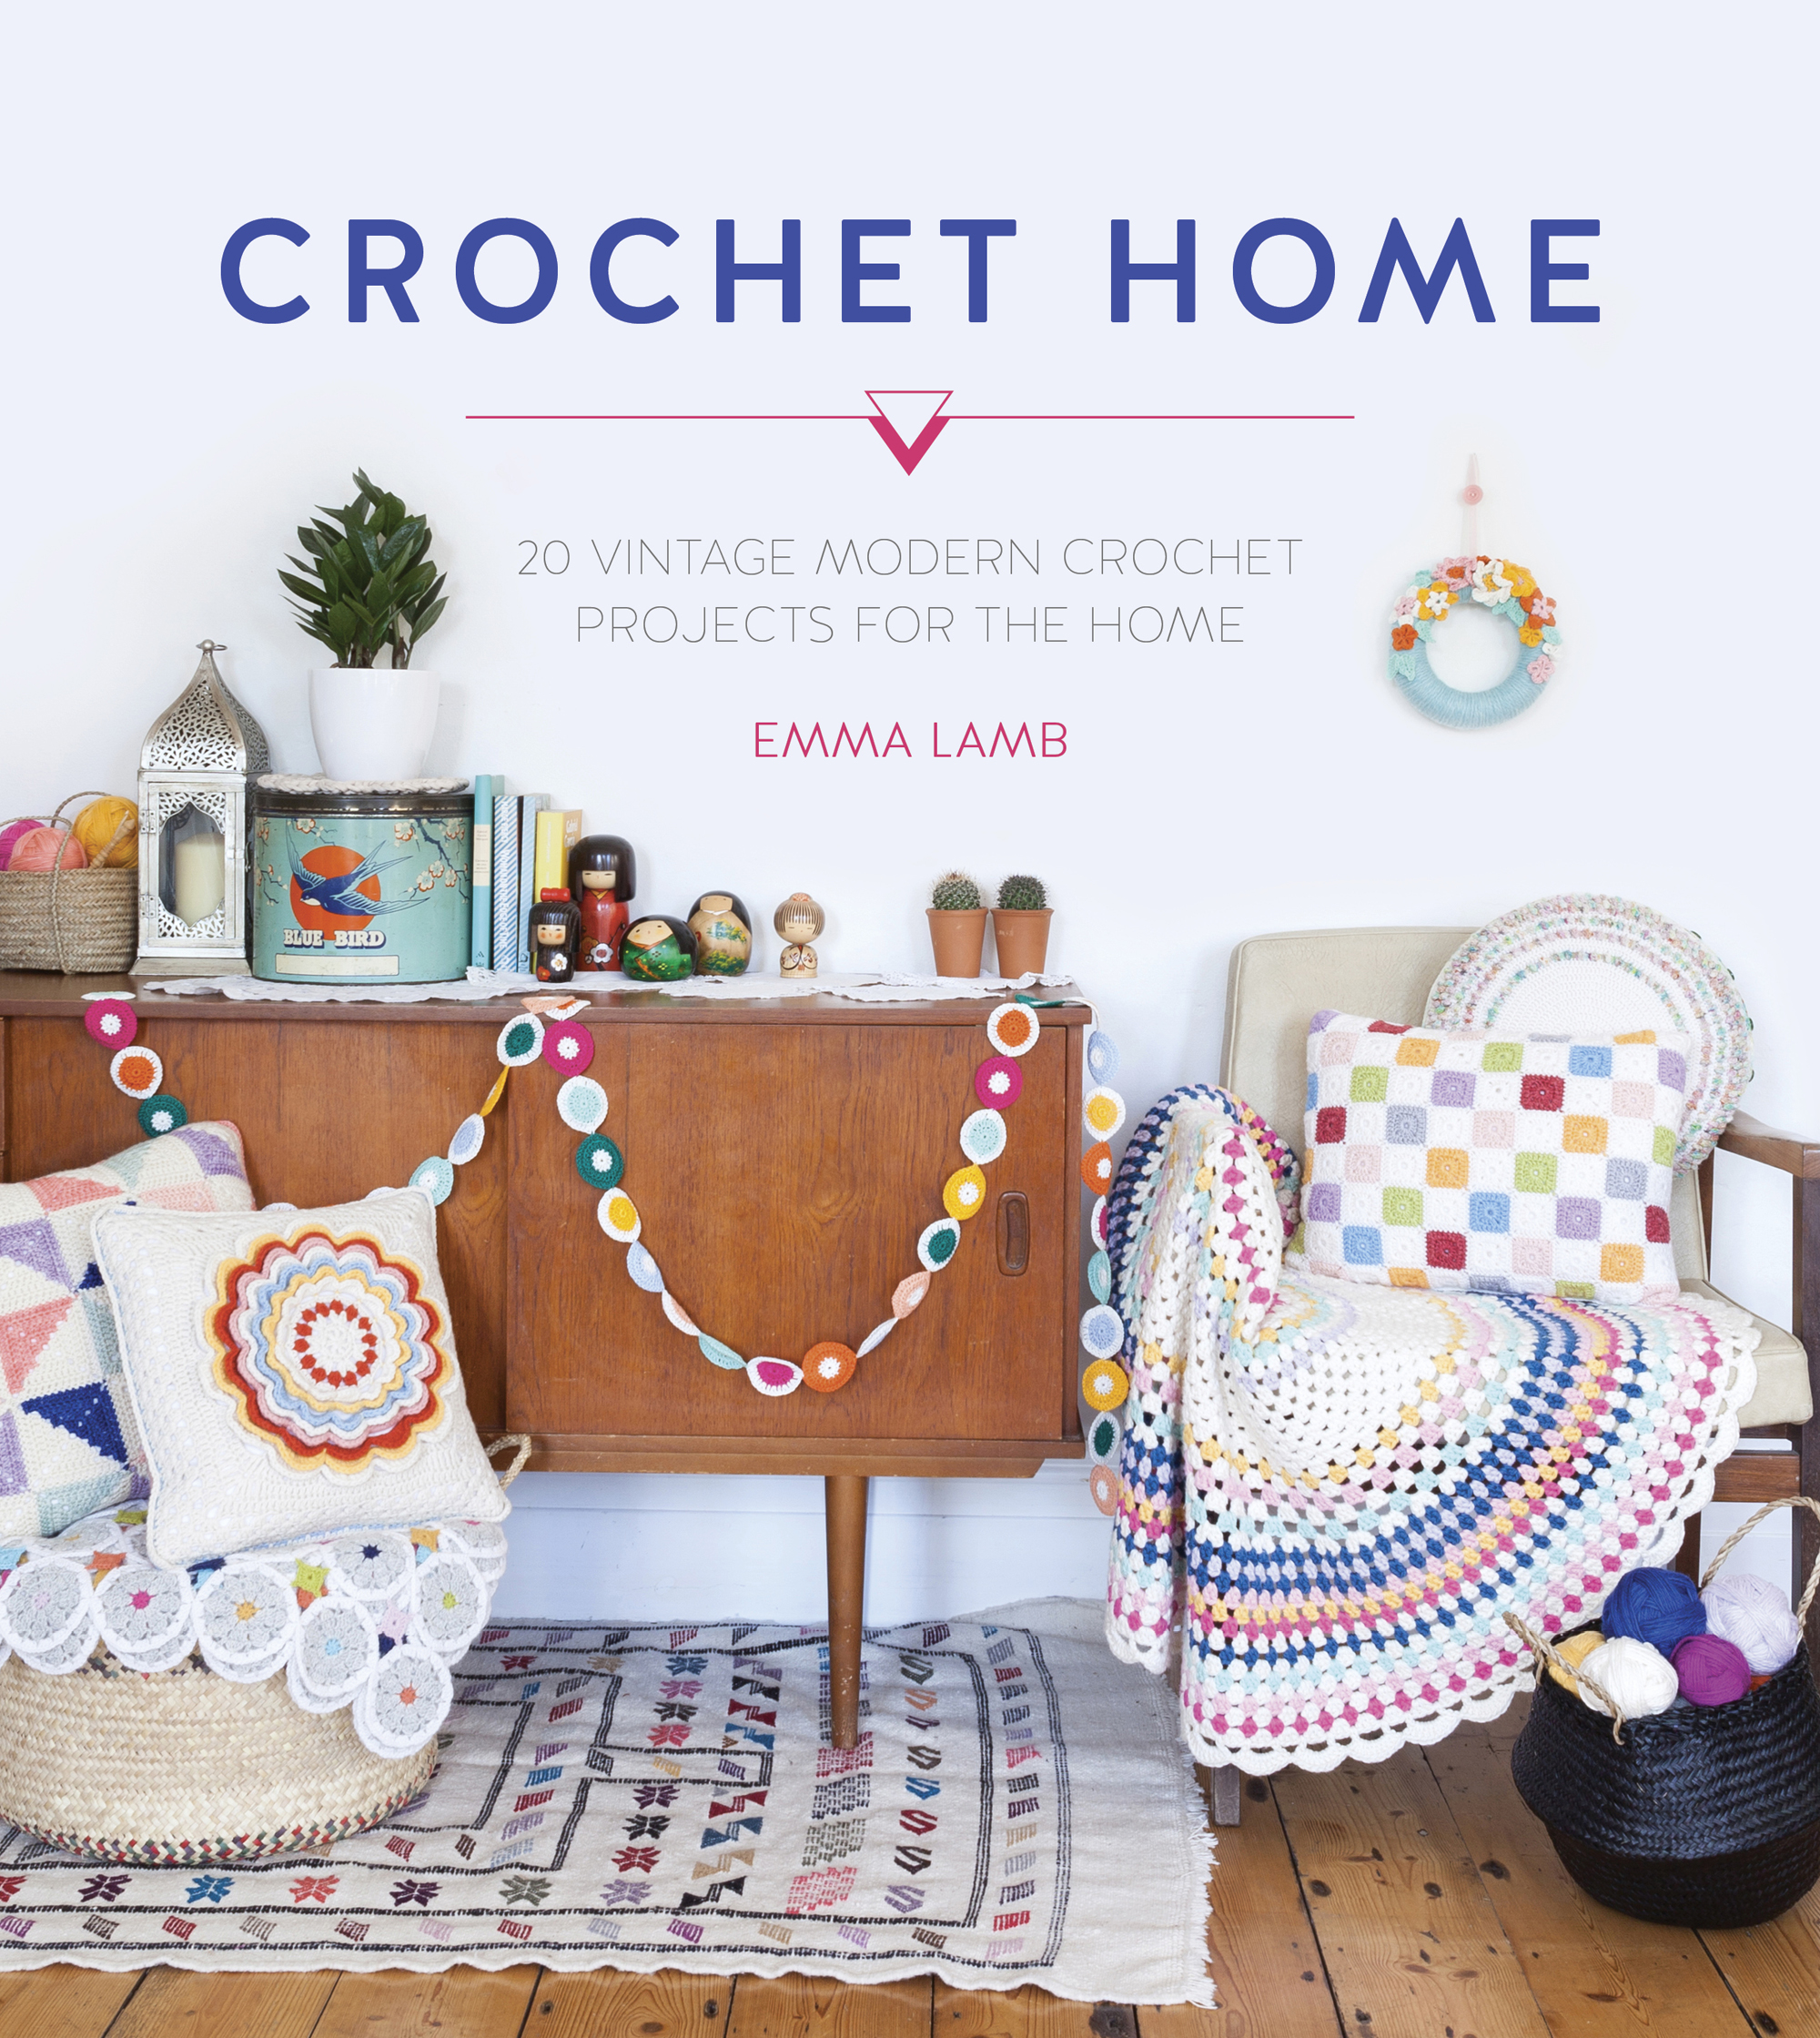 Crochet Home by Emma Lamb